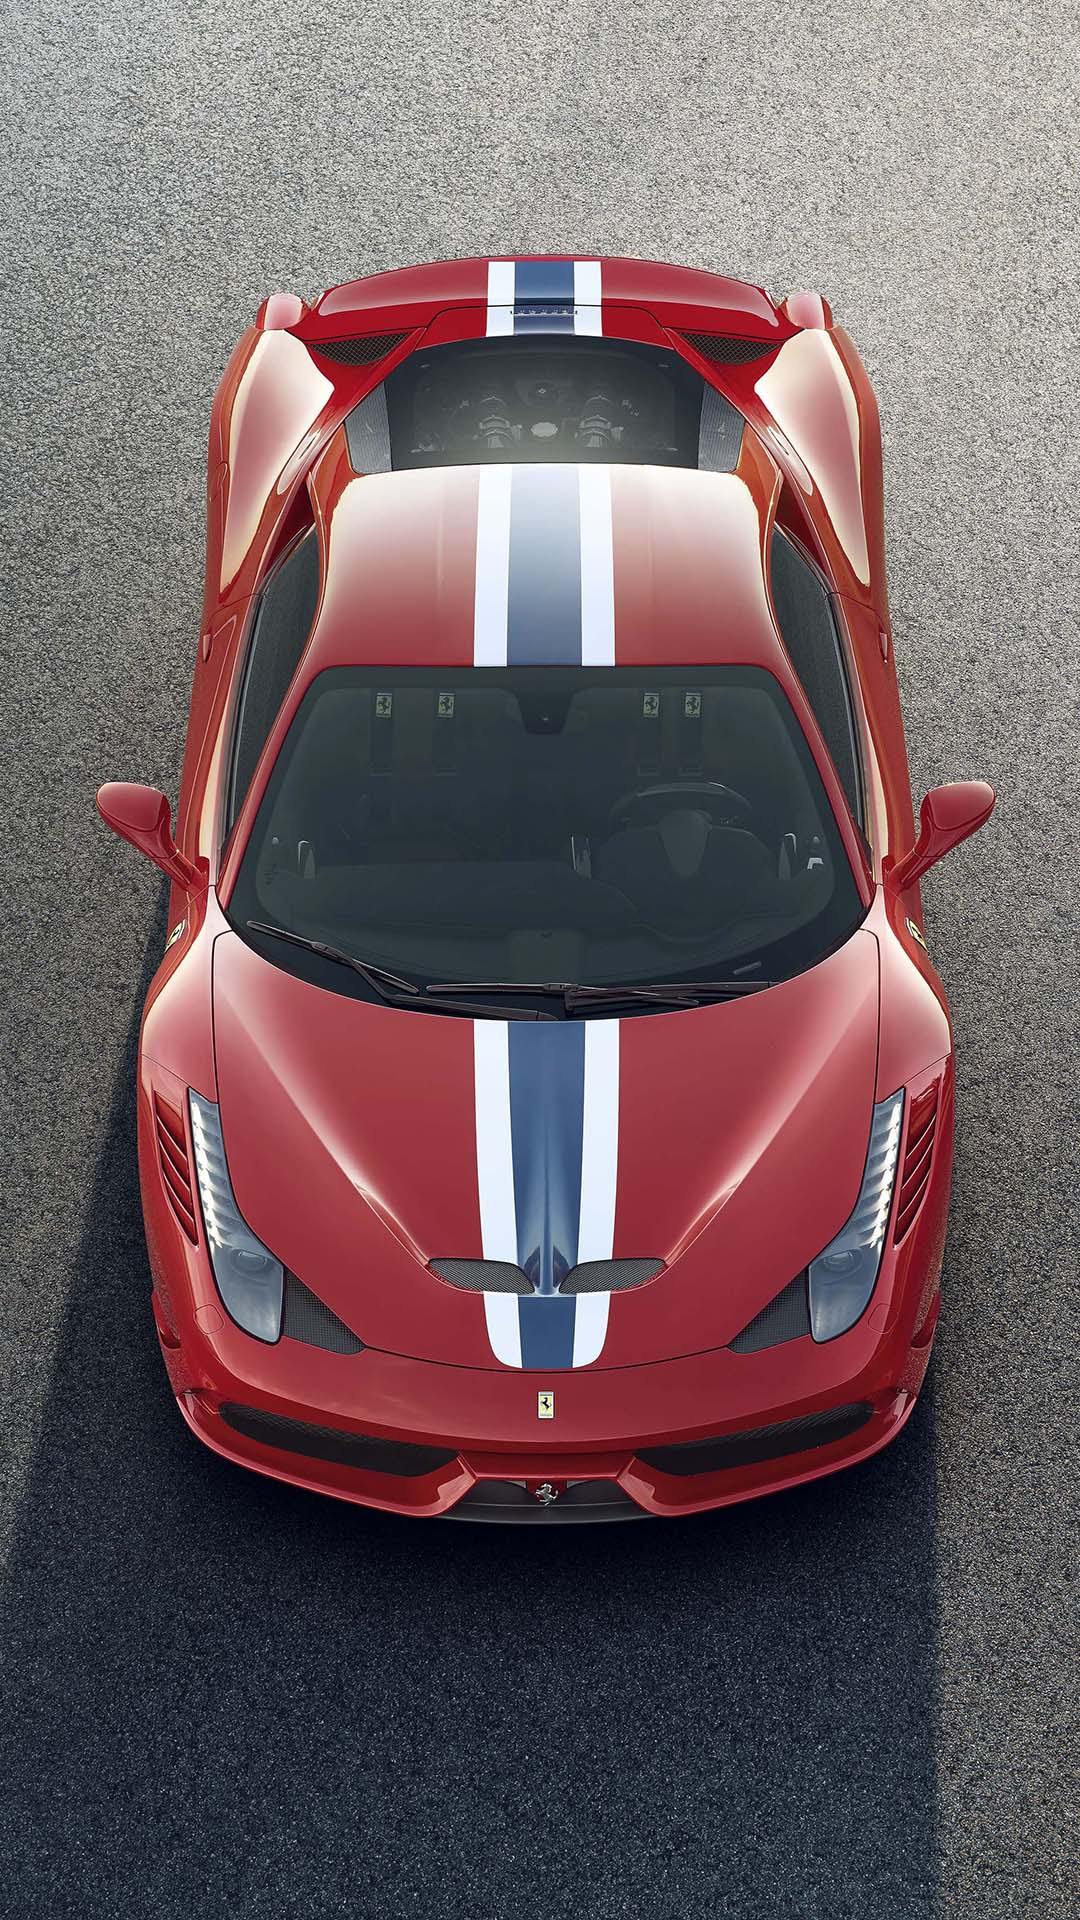 Ferrari 458 Speciale Best Htc One Wallpapers